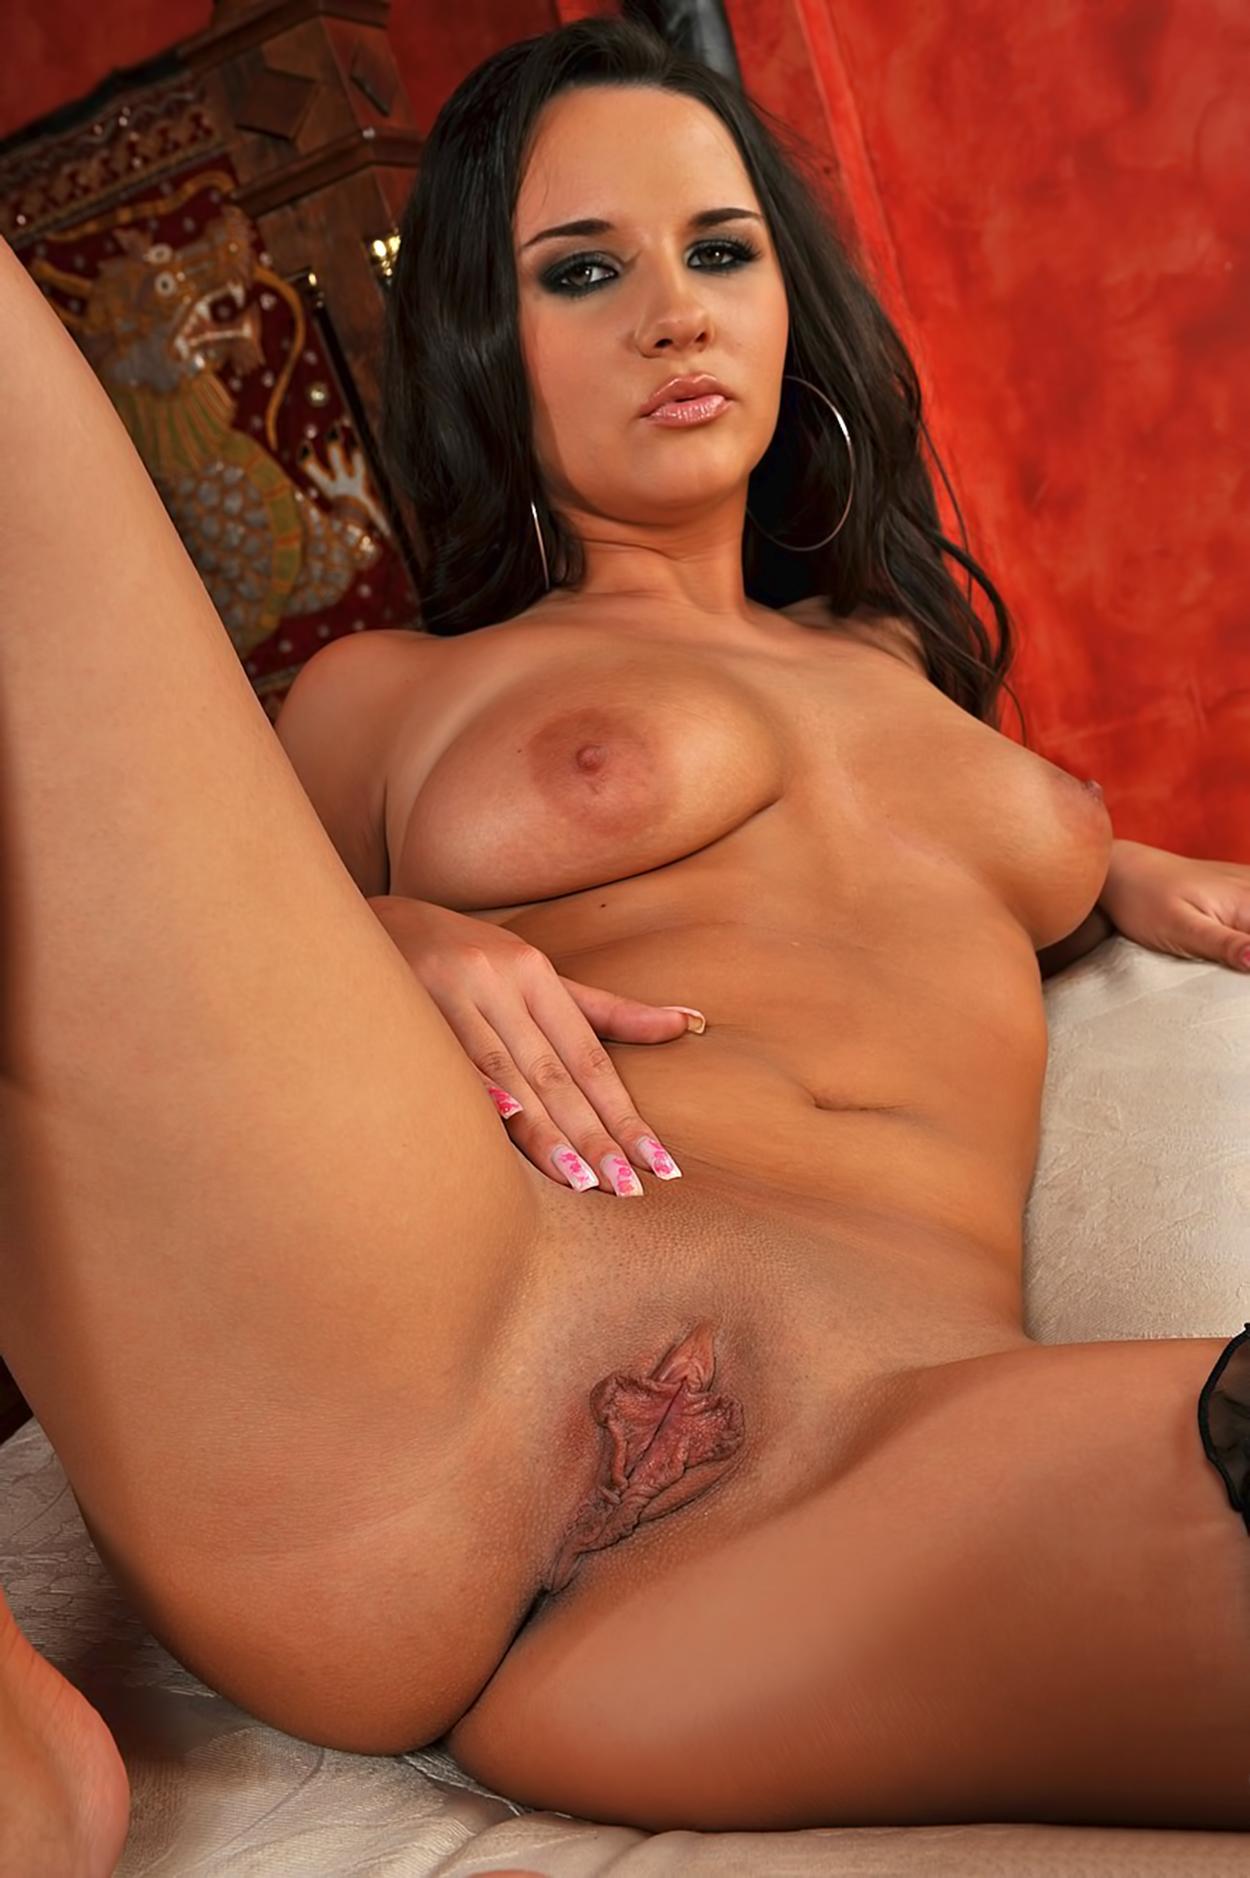 Sister in law big butt boobs XXX